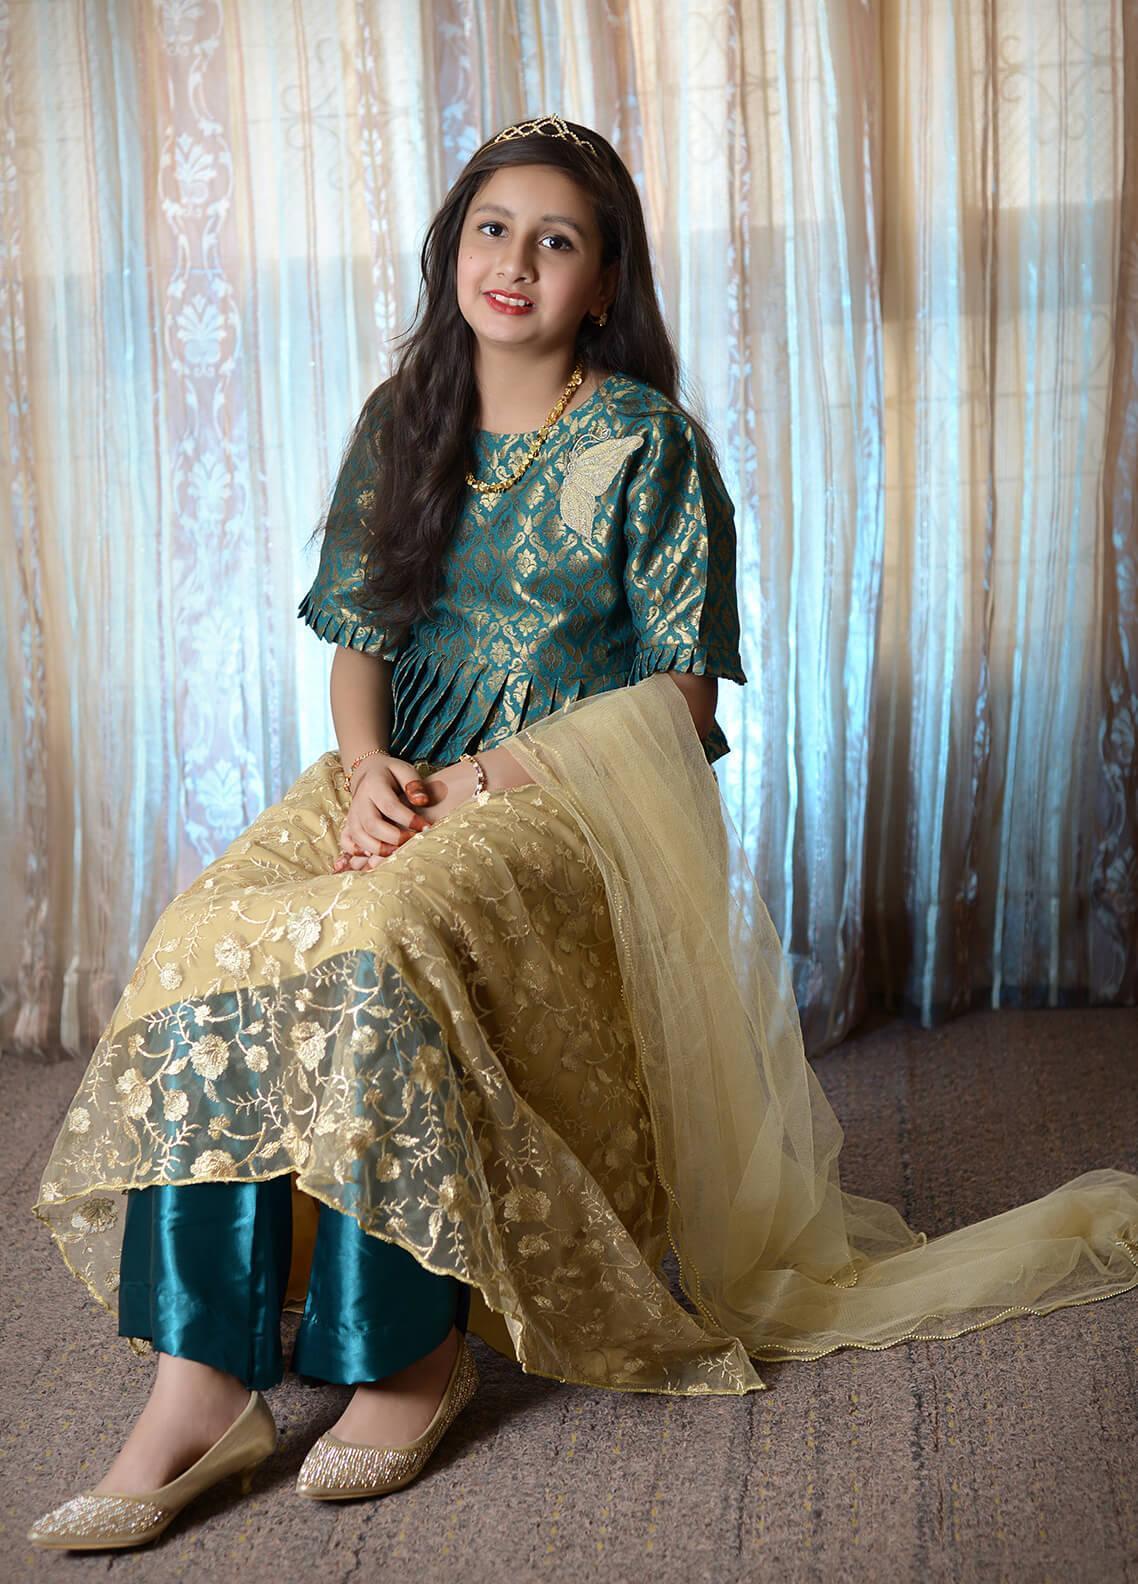 Nargis Shaheen Chiffon Formal 3 Piece Suit for Girls -  NSK-007 Golden